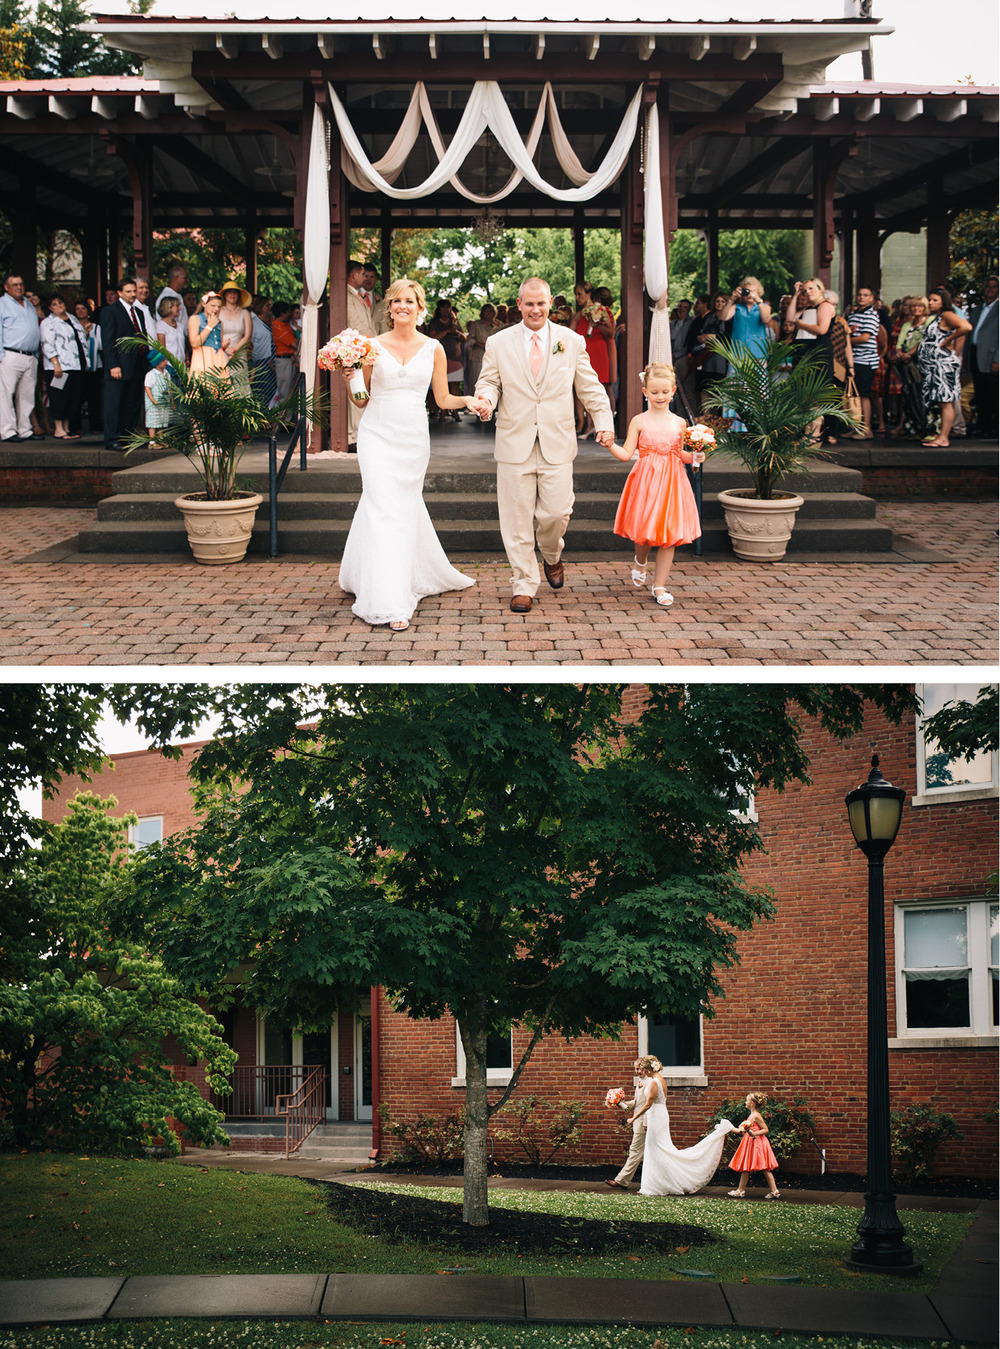 CK-Photo-Nashville-wedding-photography-bd8.jpg